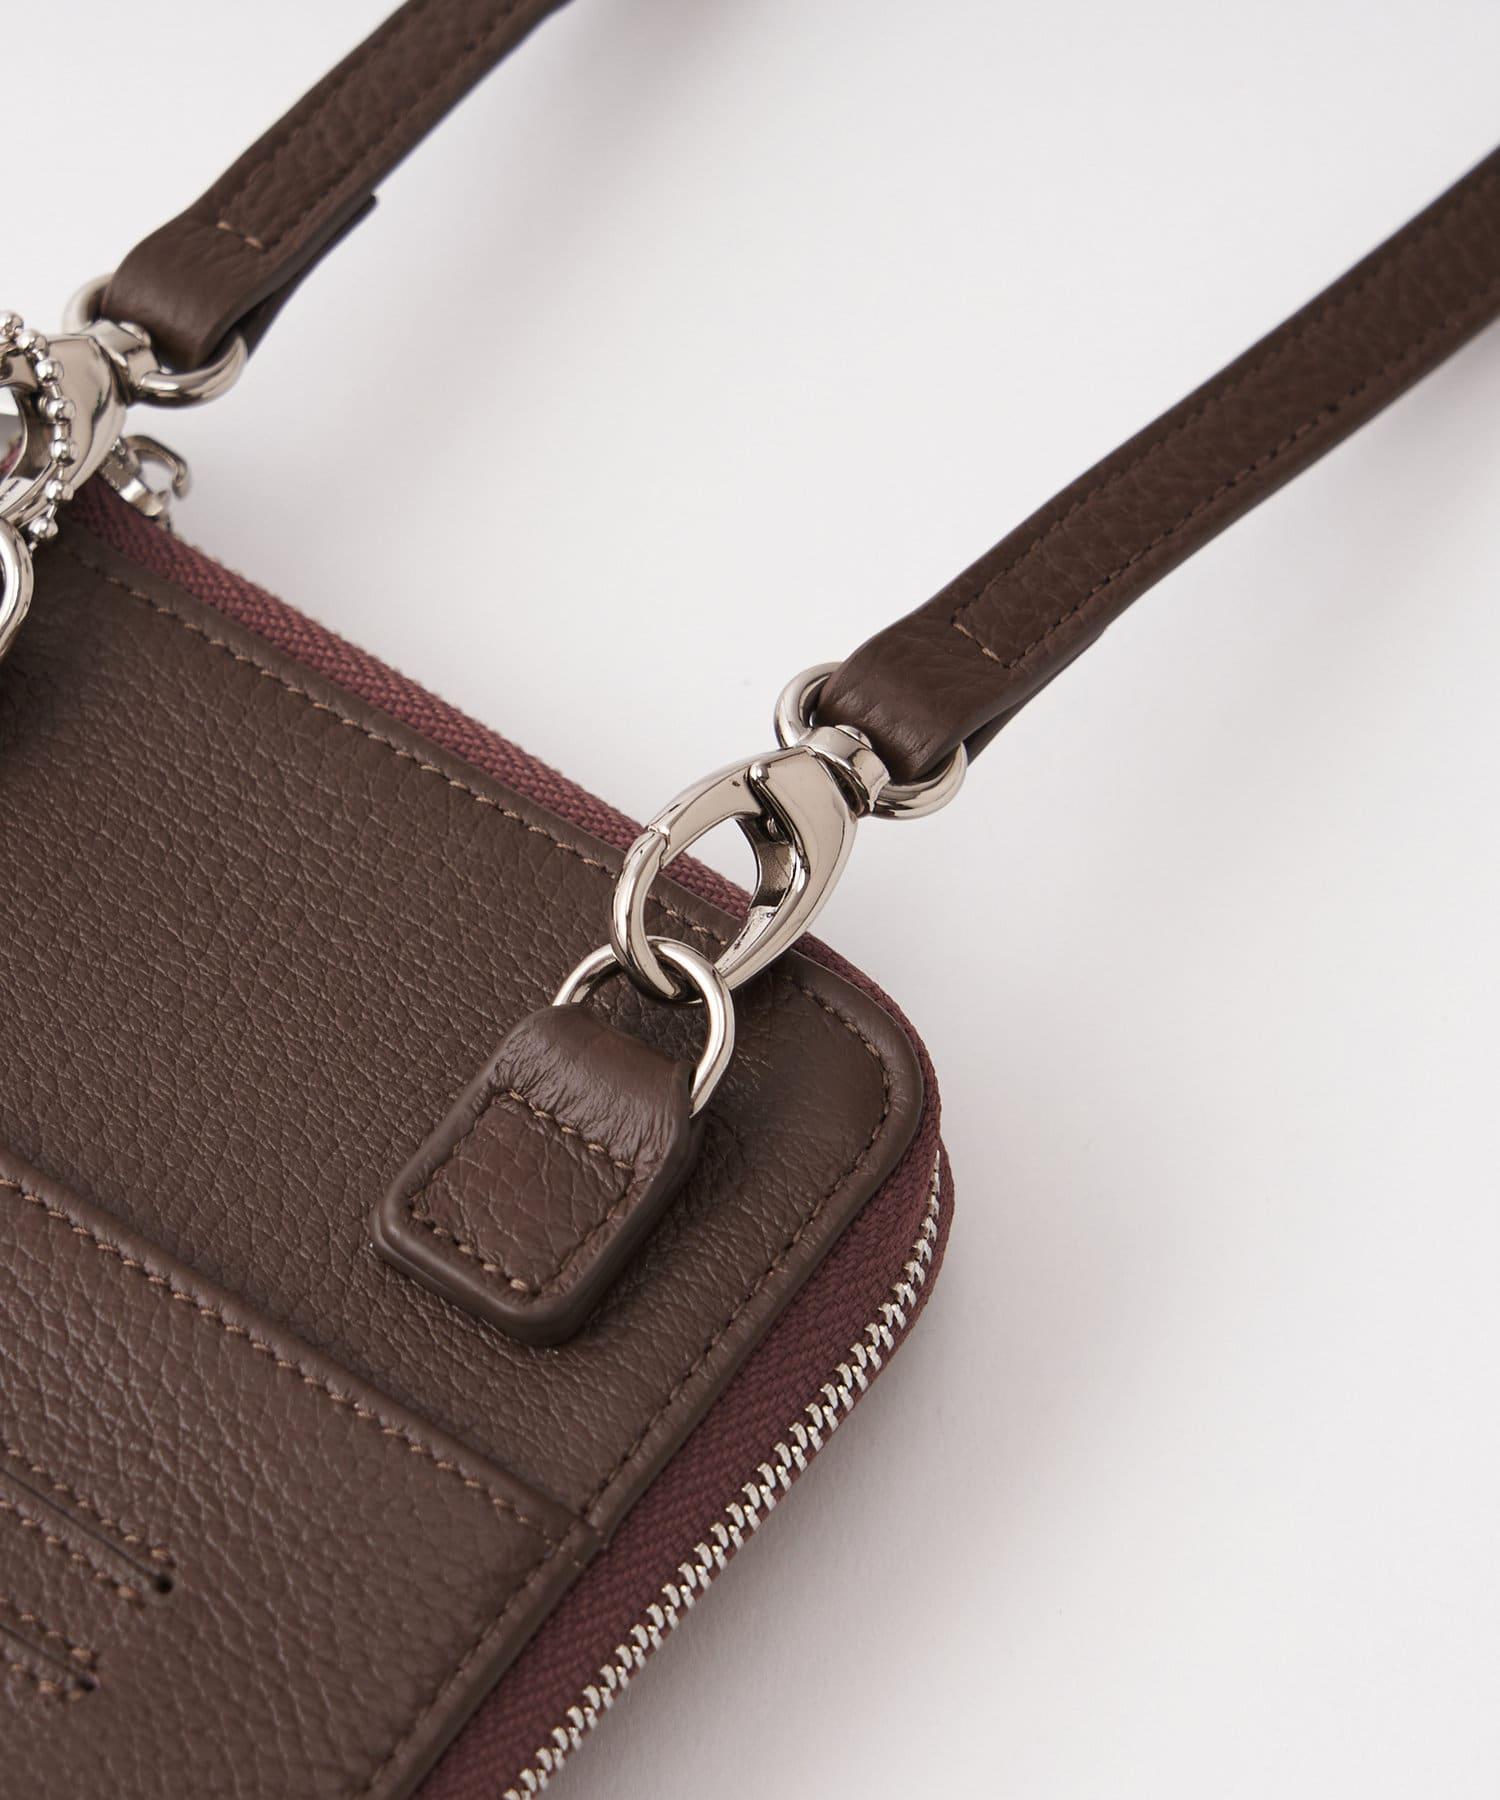 PLUS OTO.HA(プラス オトハ) スマホ+財布+キーケースハンズフリーバック